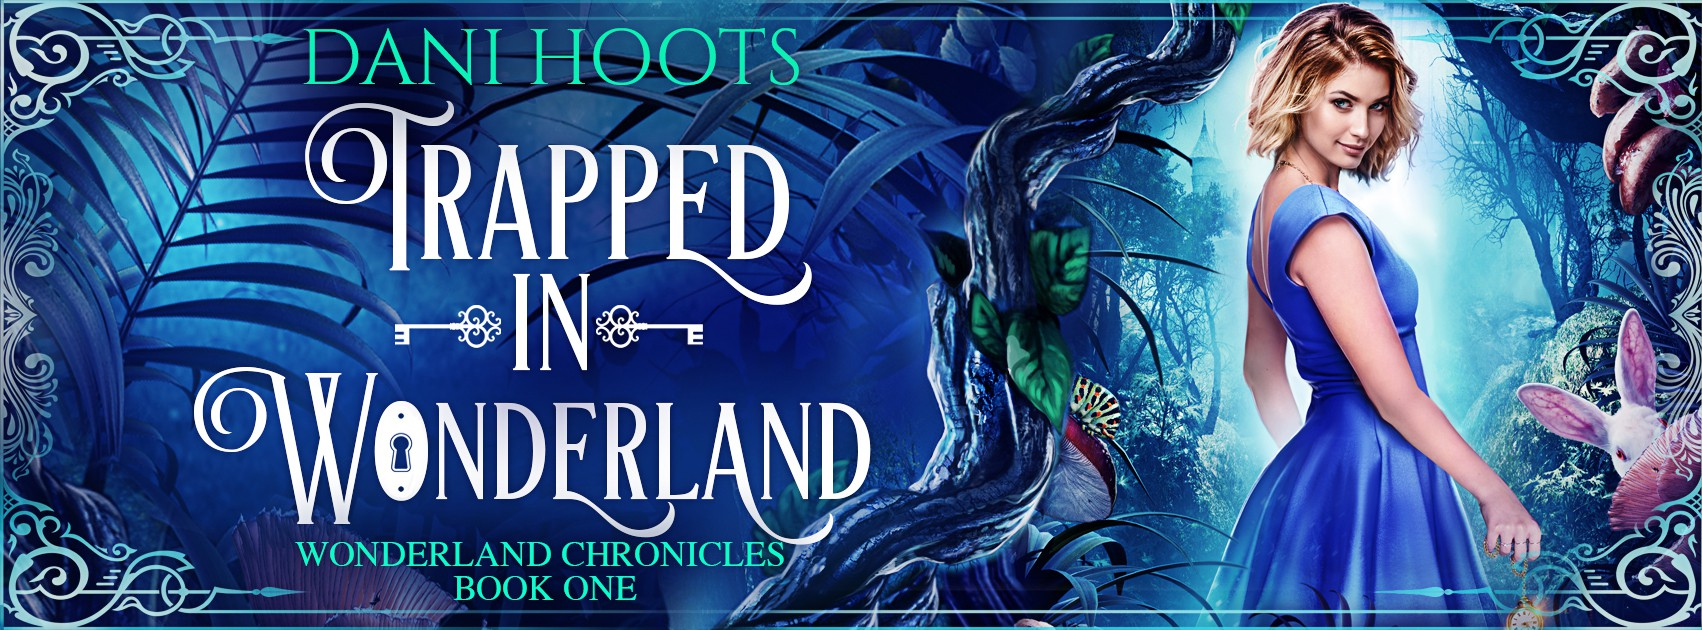 Wonderland Chronicles book 1 of 3